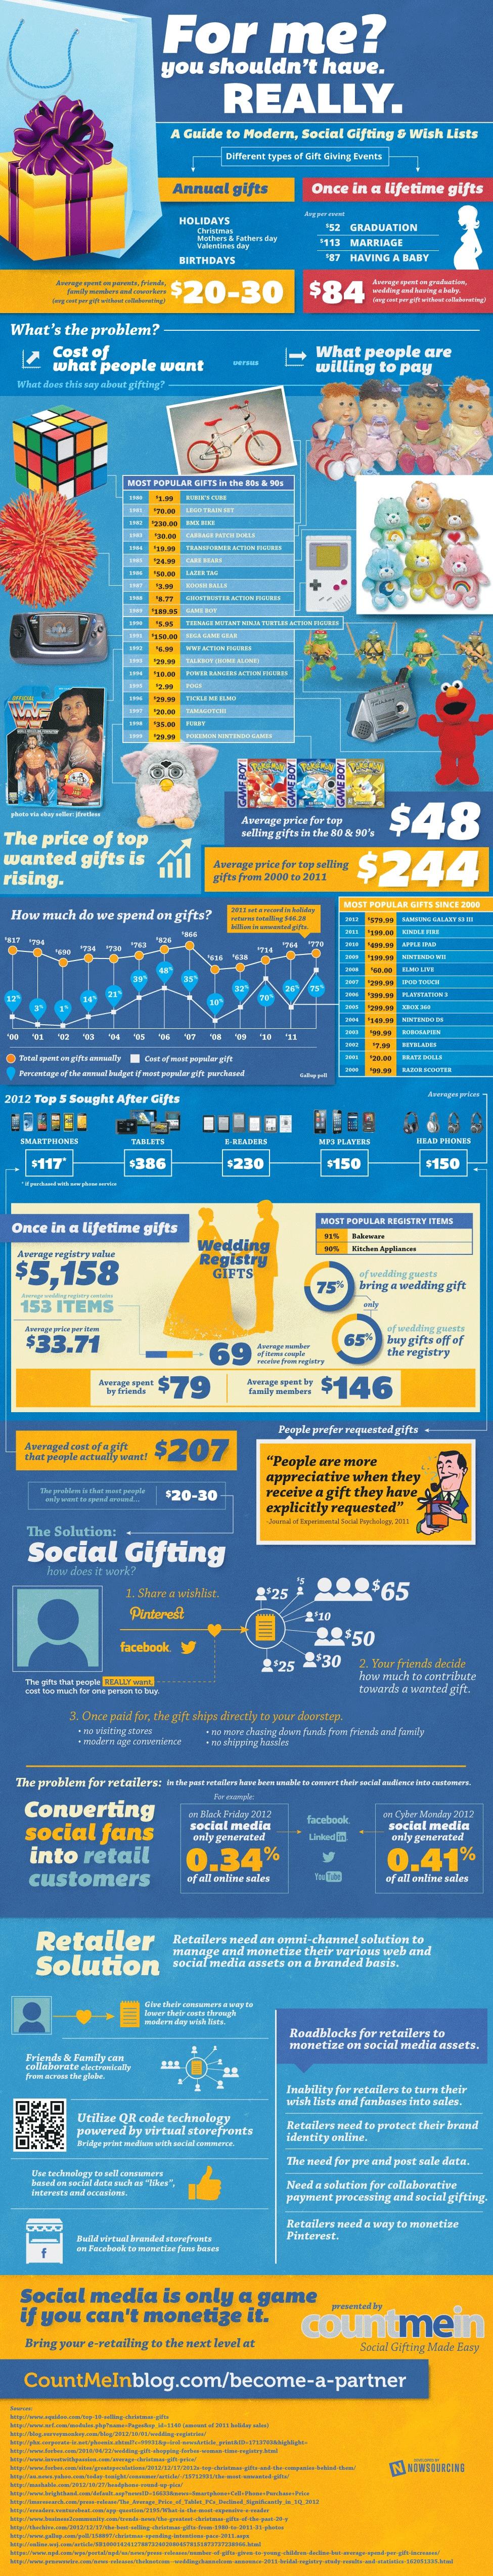 social-gifting-social-media